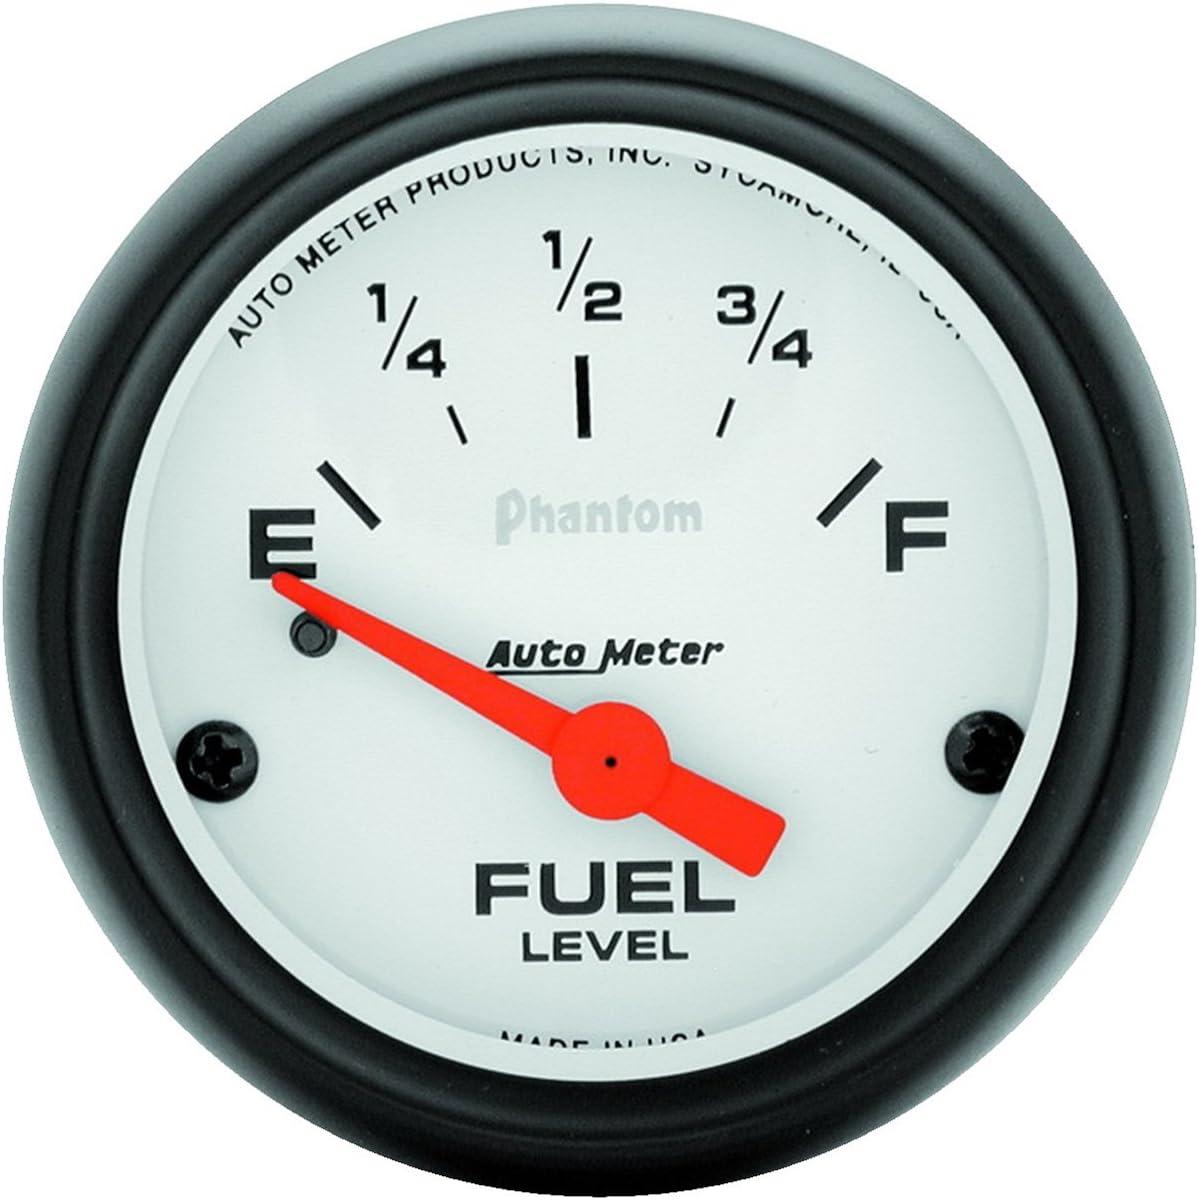 Auto Meter 5716 Phantom Electric Fuel Direct store Bargain Level 2 Gauge 1 Sho - 16